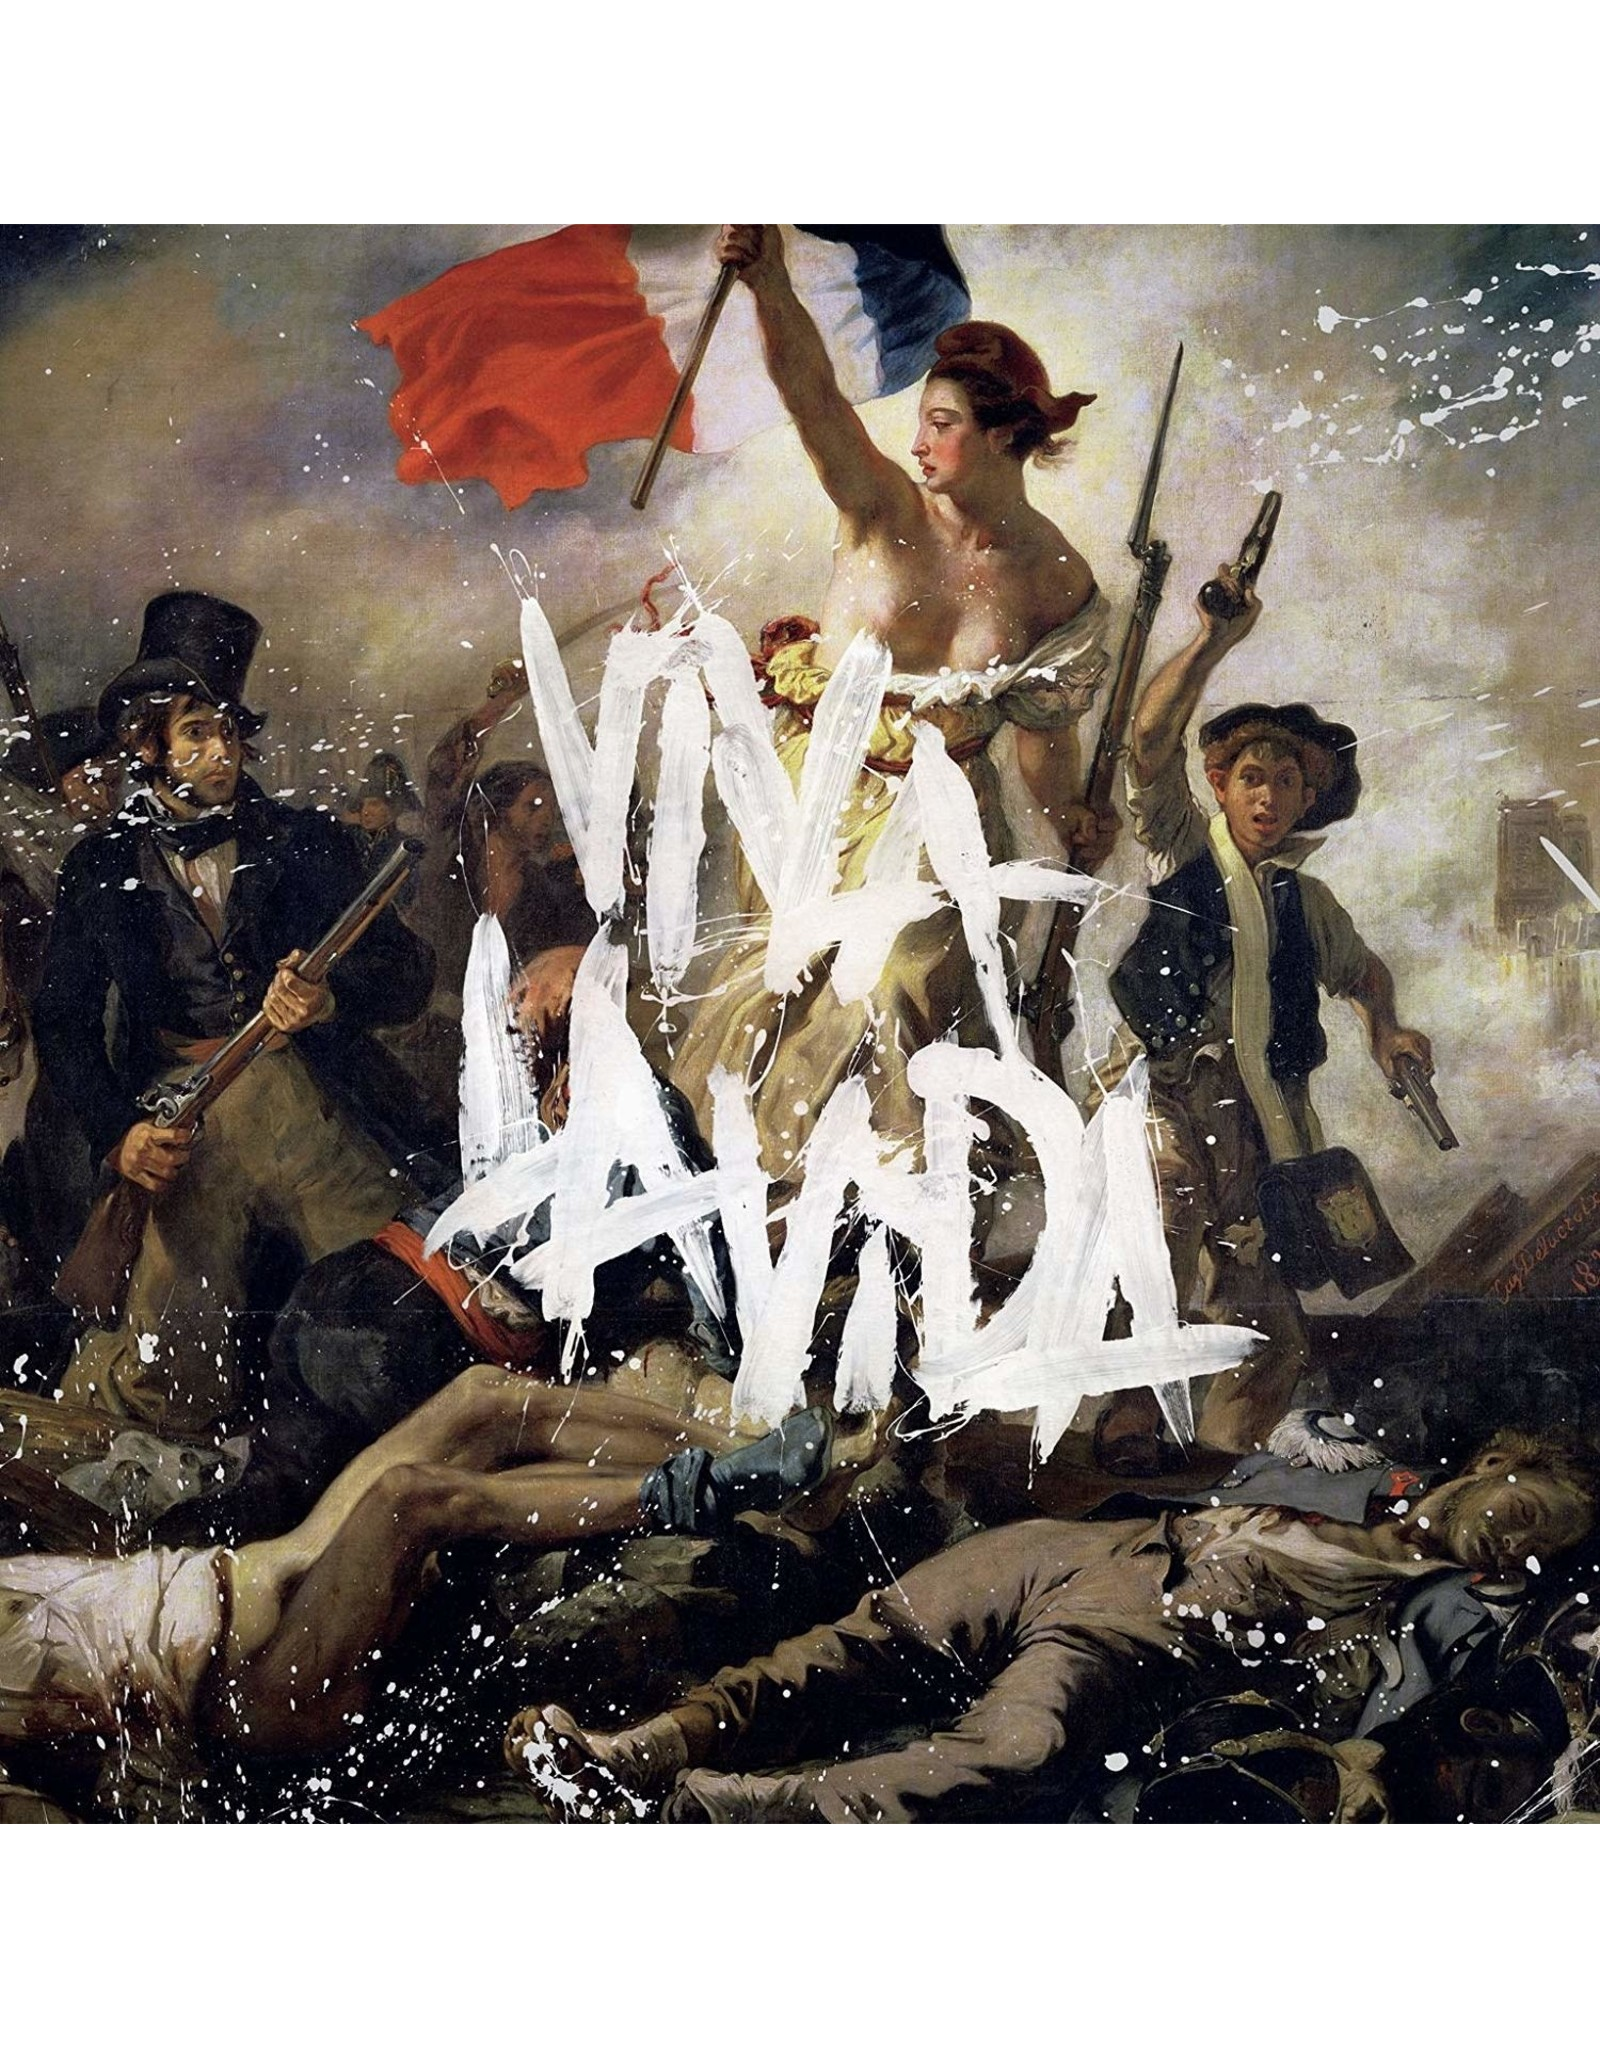 Coldplay - Viva La Vida and All His Friends